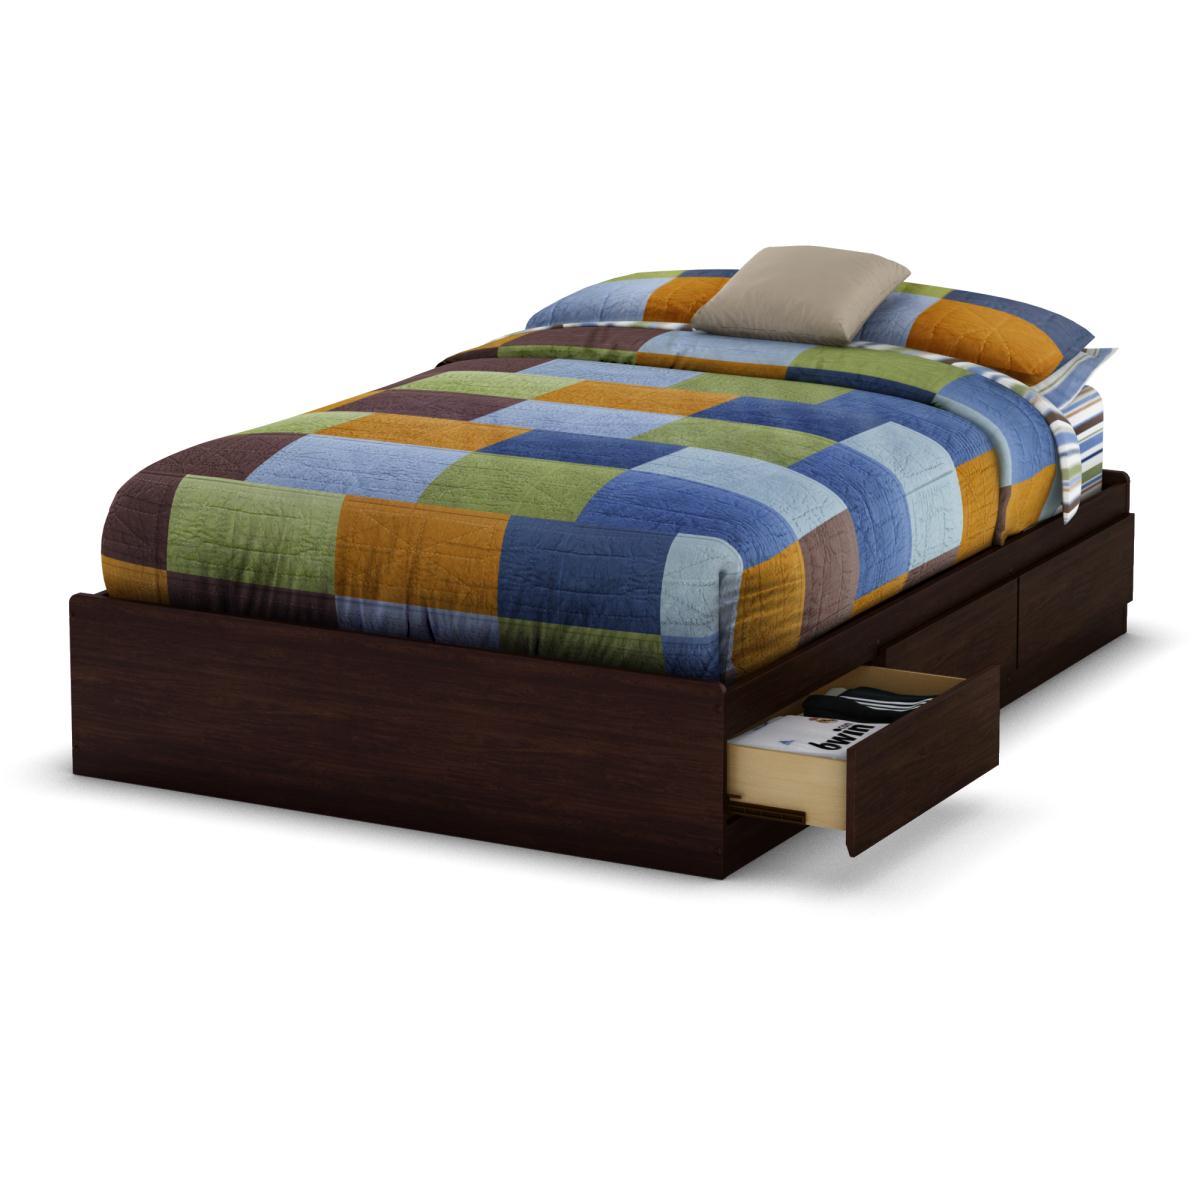 South Shore Lounge Full Mates Bed - Havana